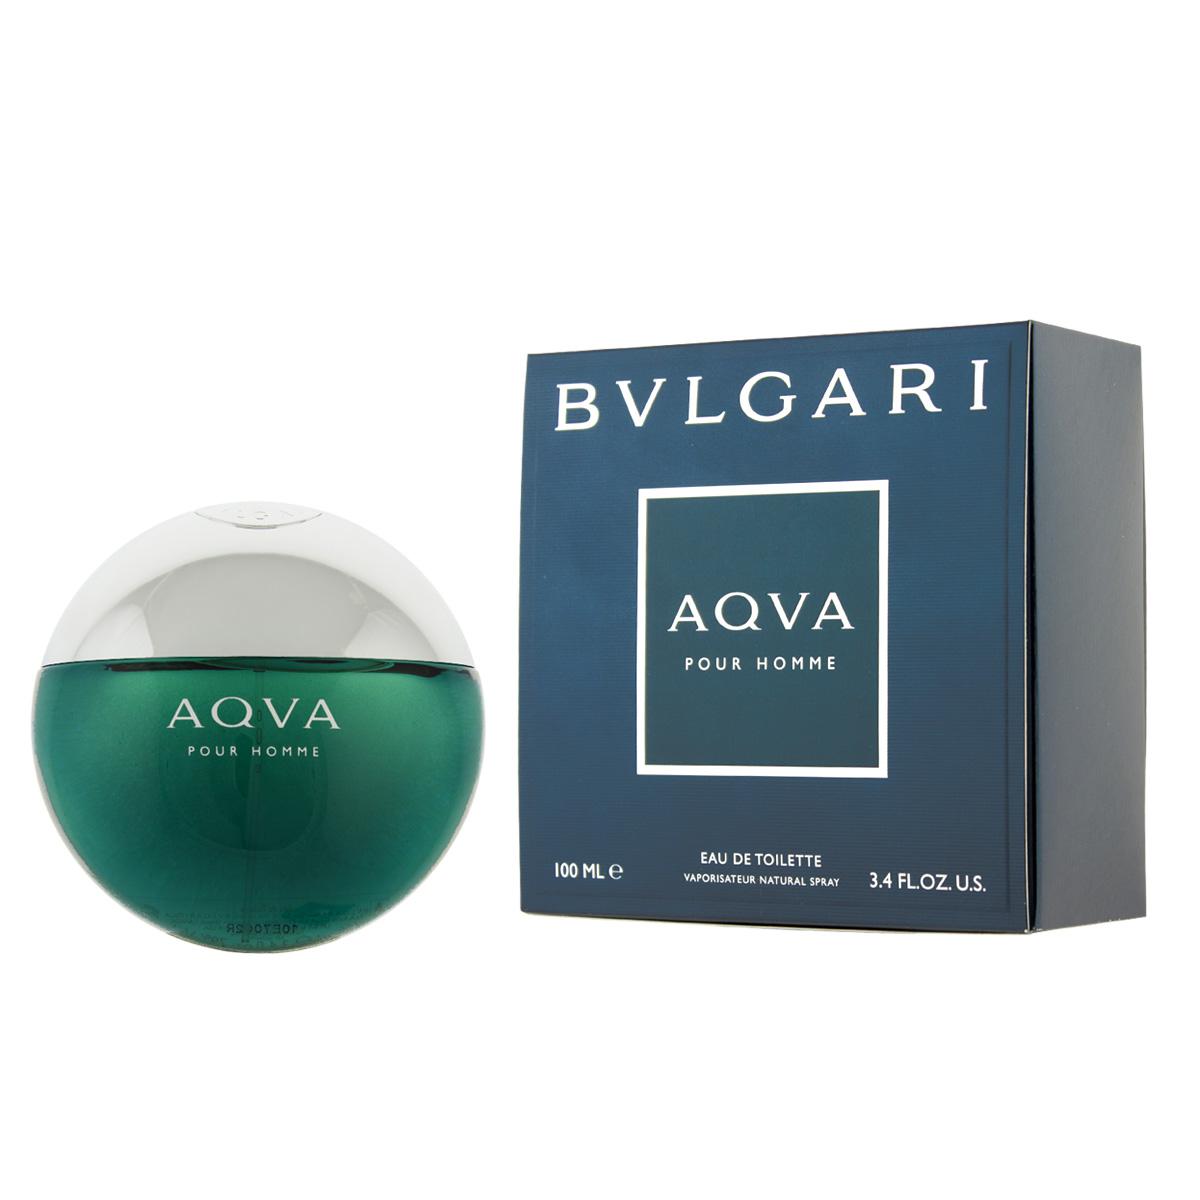 Bvlgari Aqva Pour Homme EDT rozpoužíváno (plné nad 80%) 100 ml M